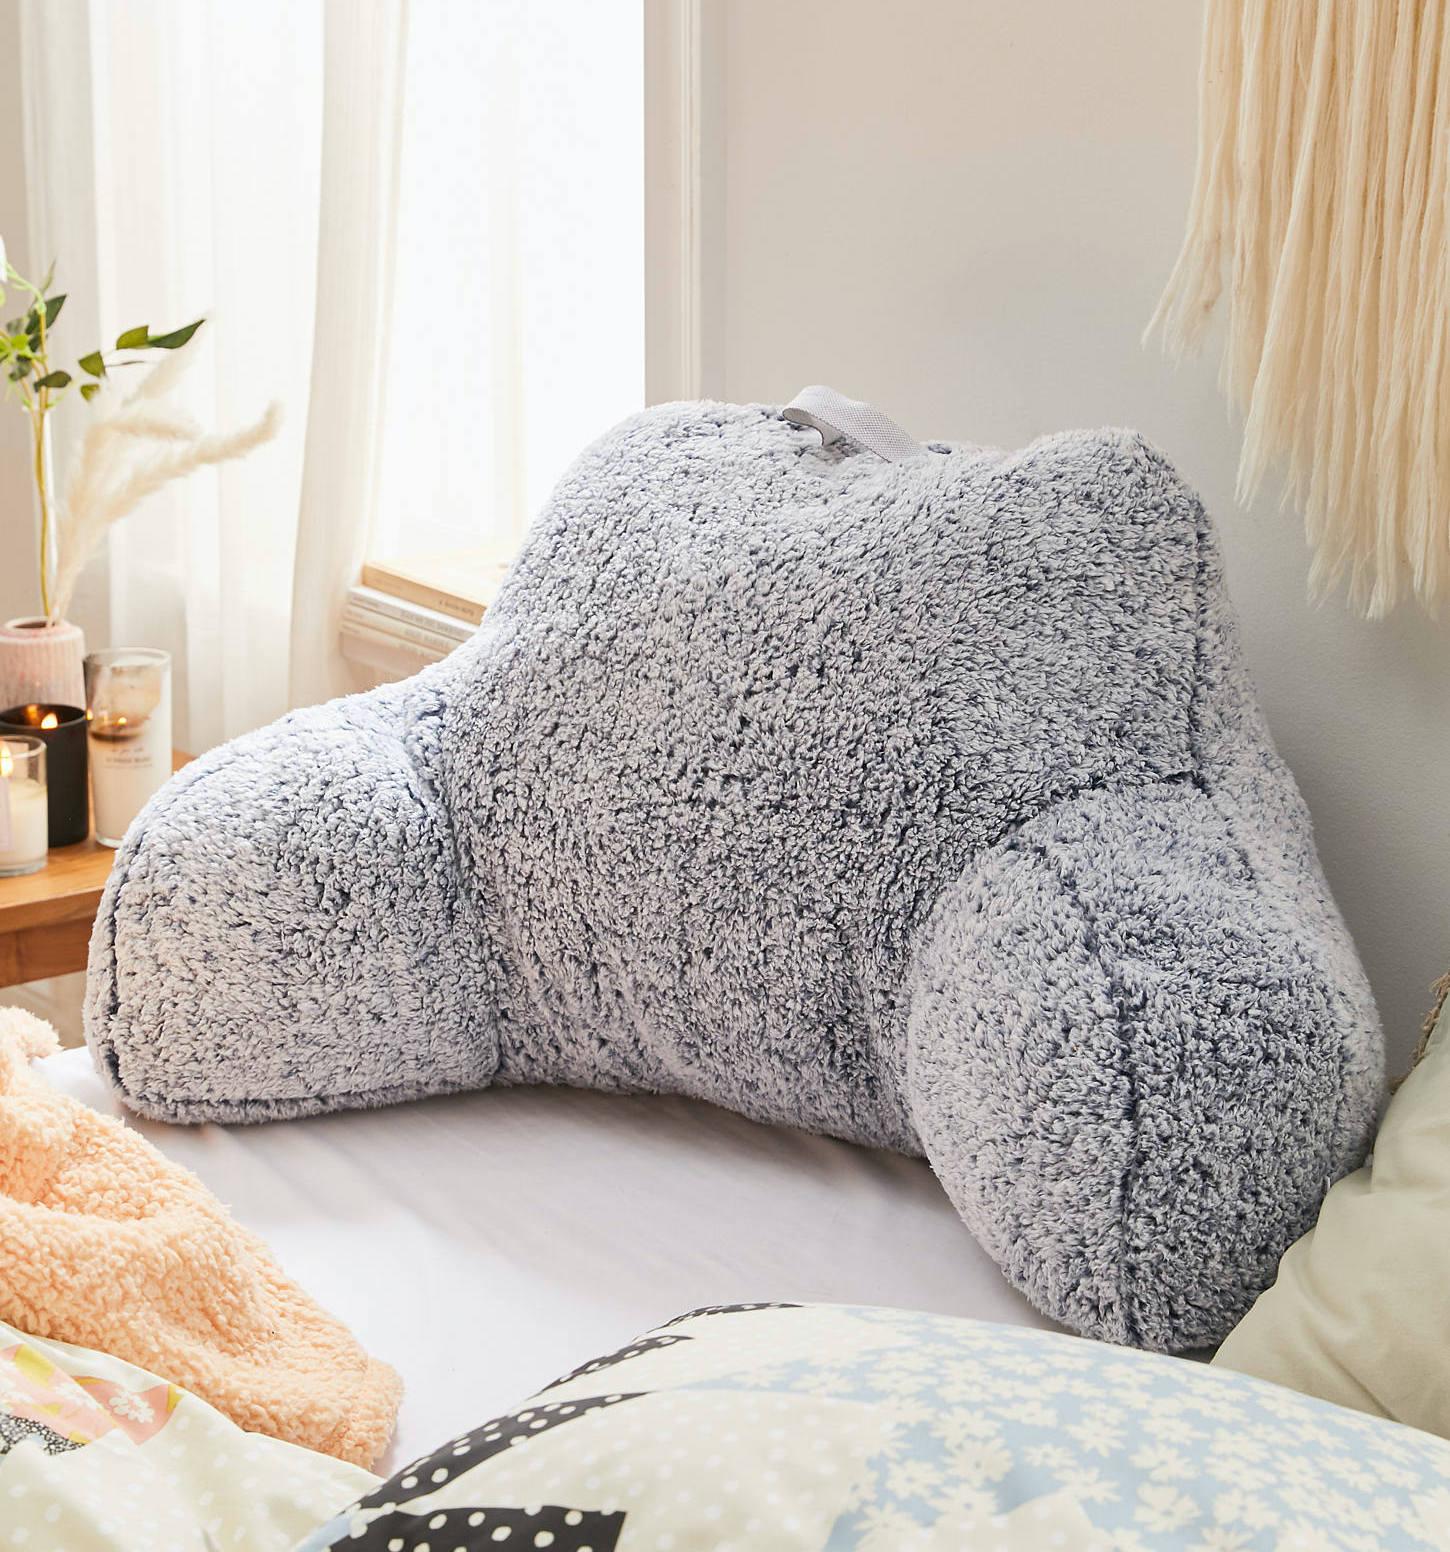 who else remembers husband pillows i